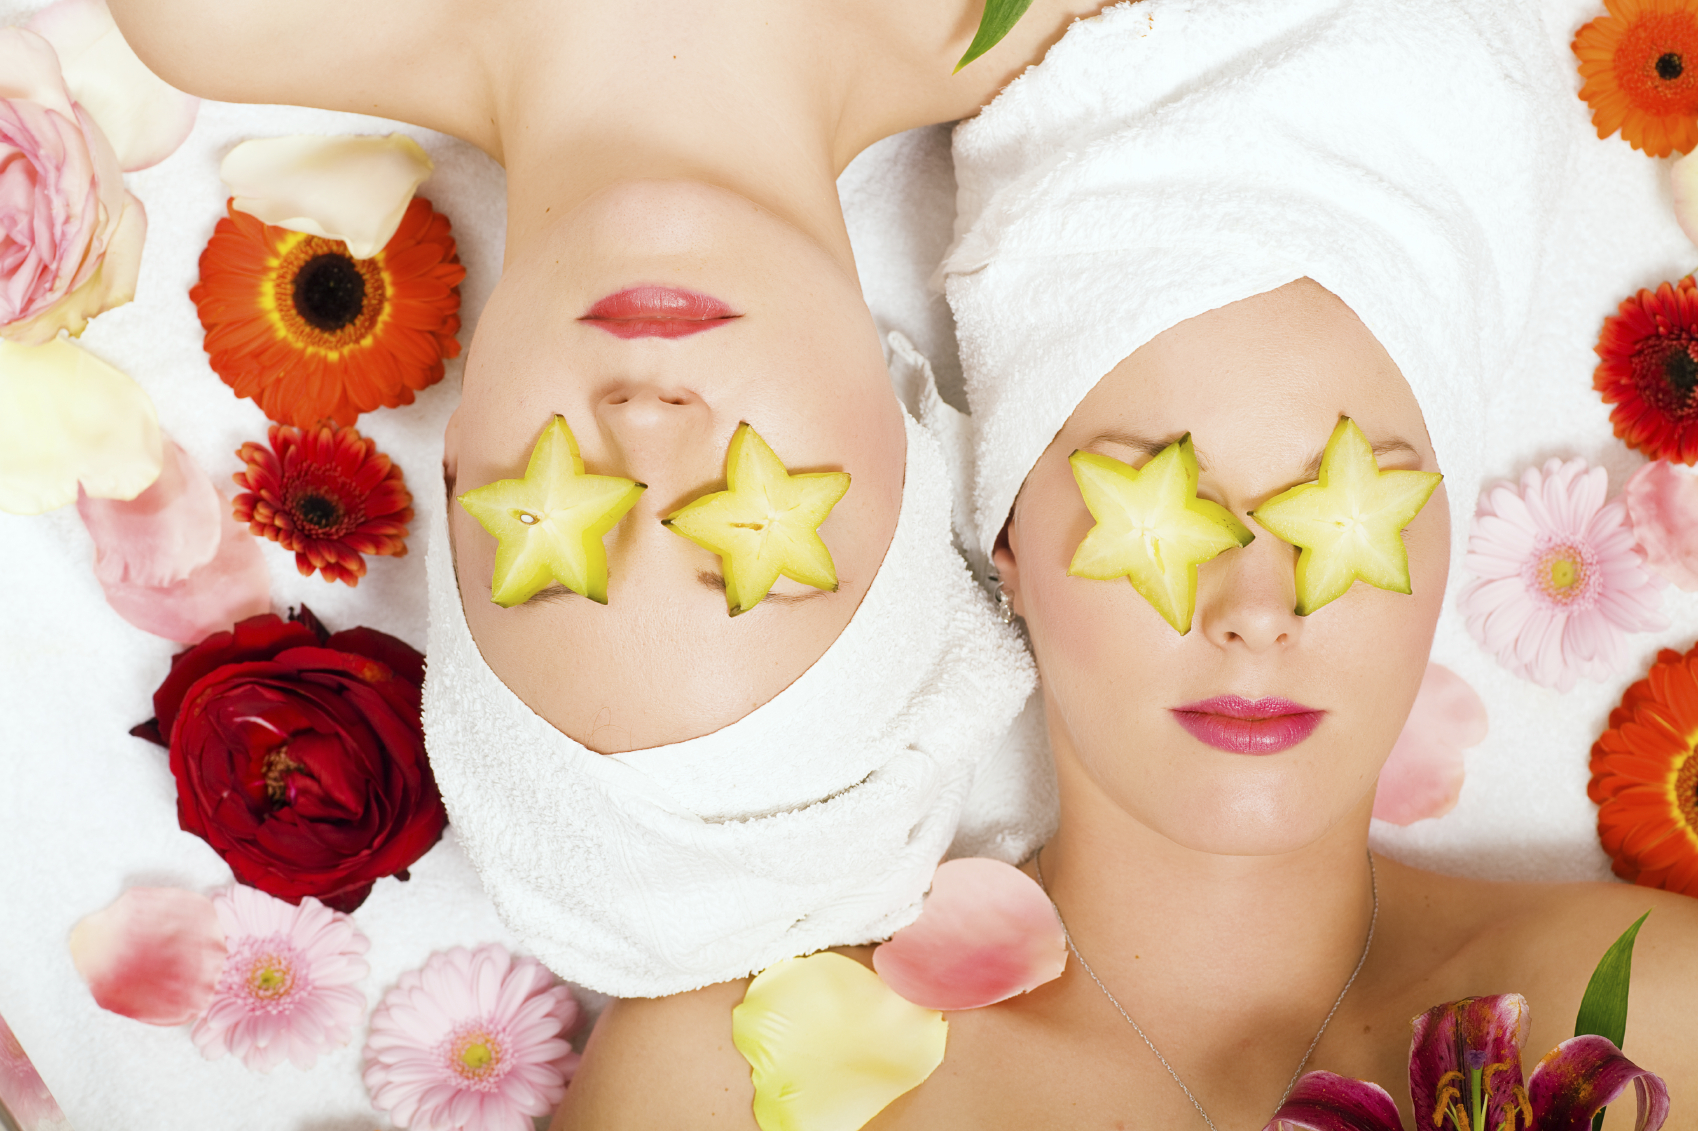 BeautyAddict.com Peels